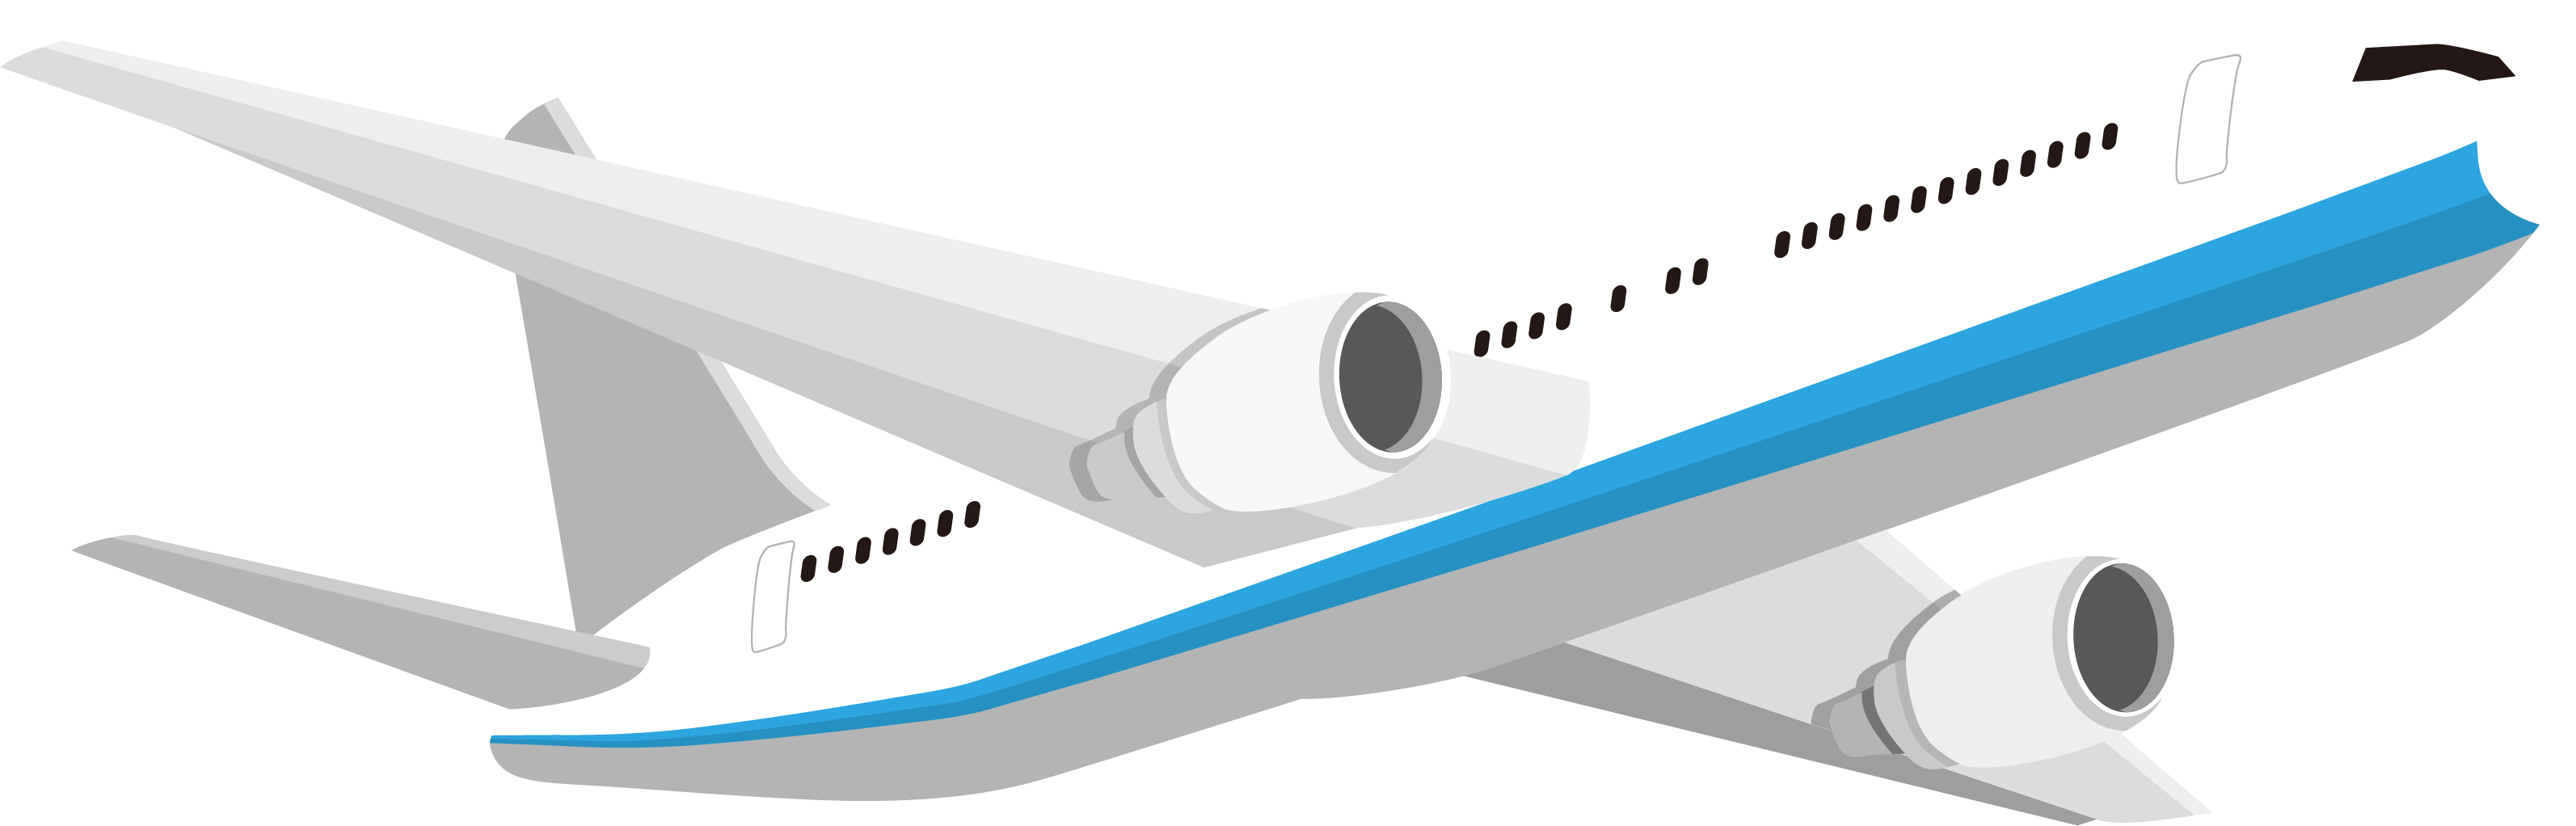 Passenger Air Travel